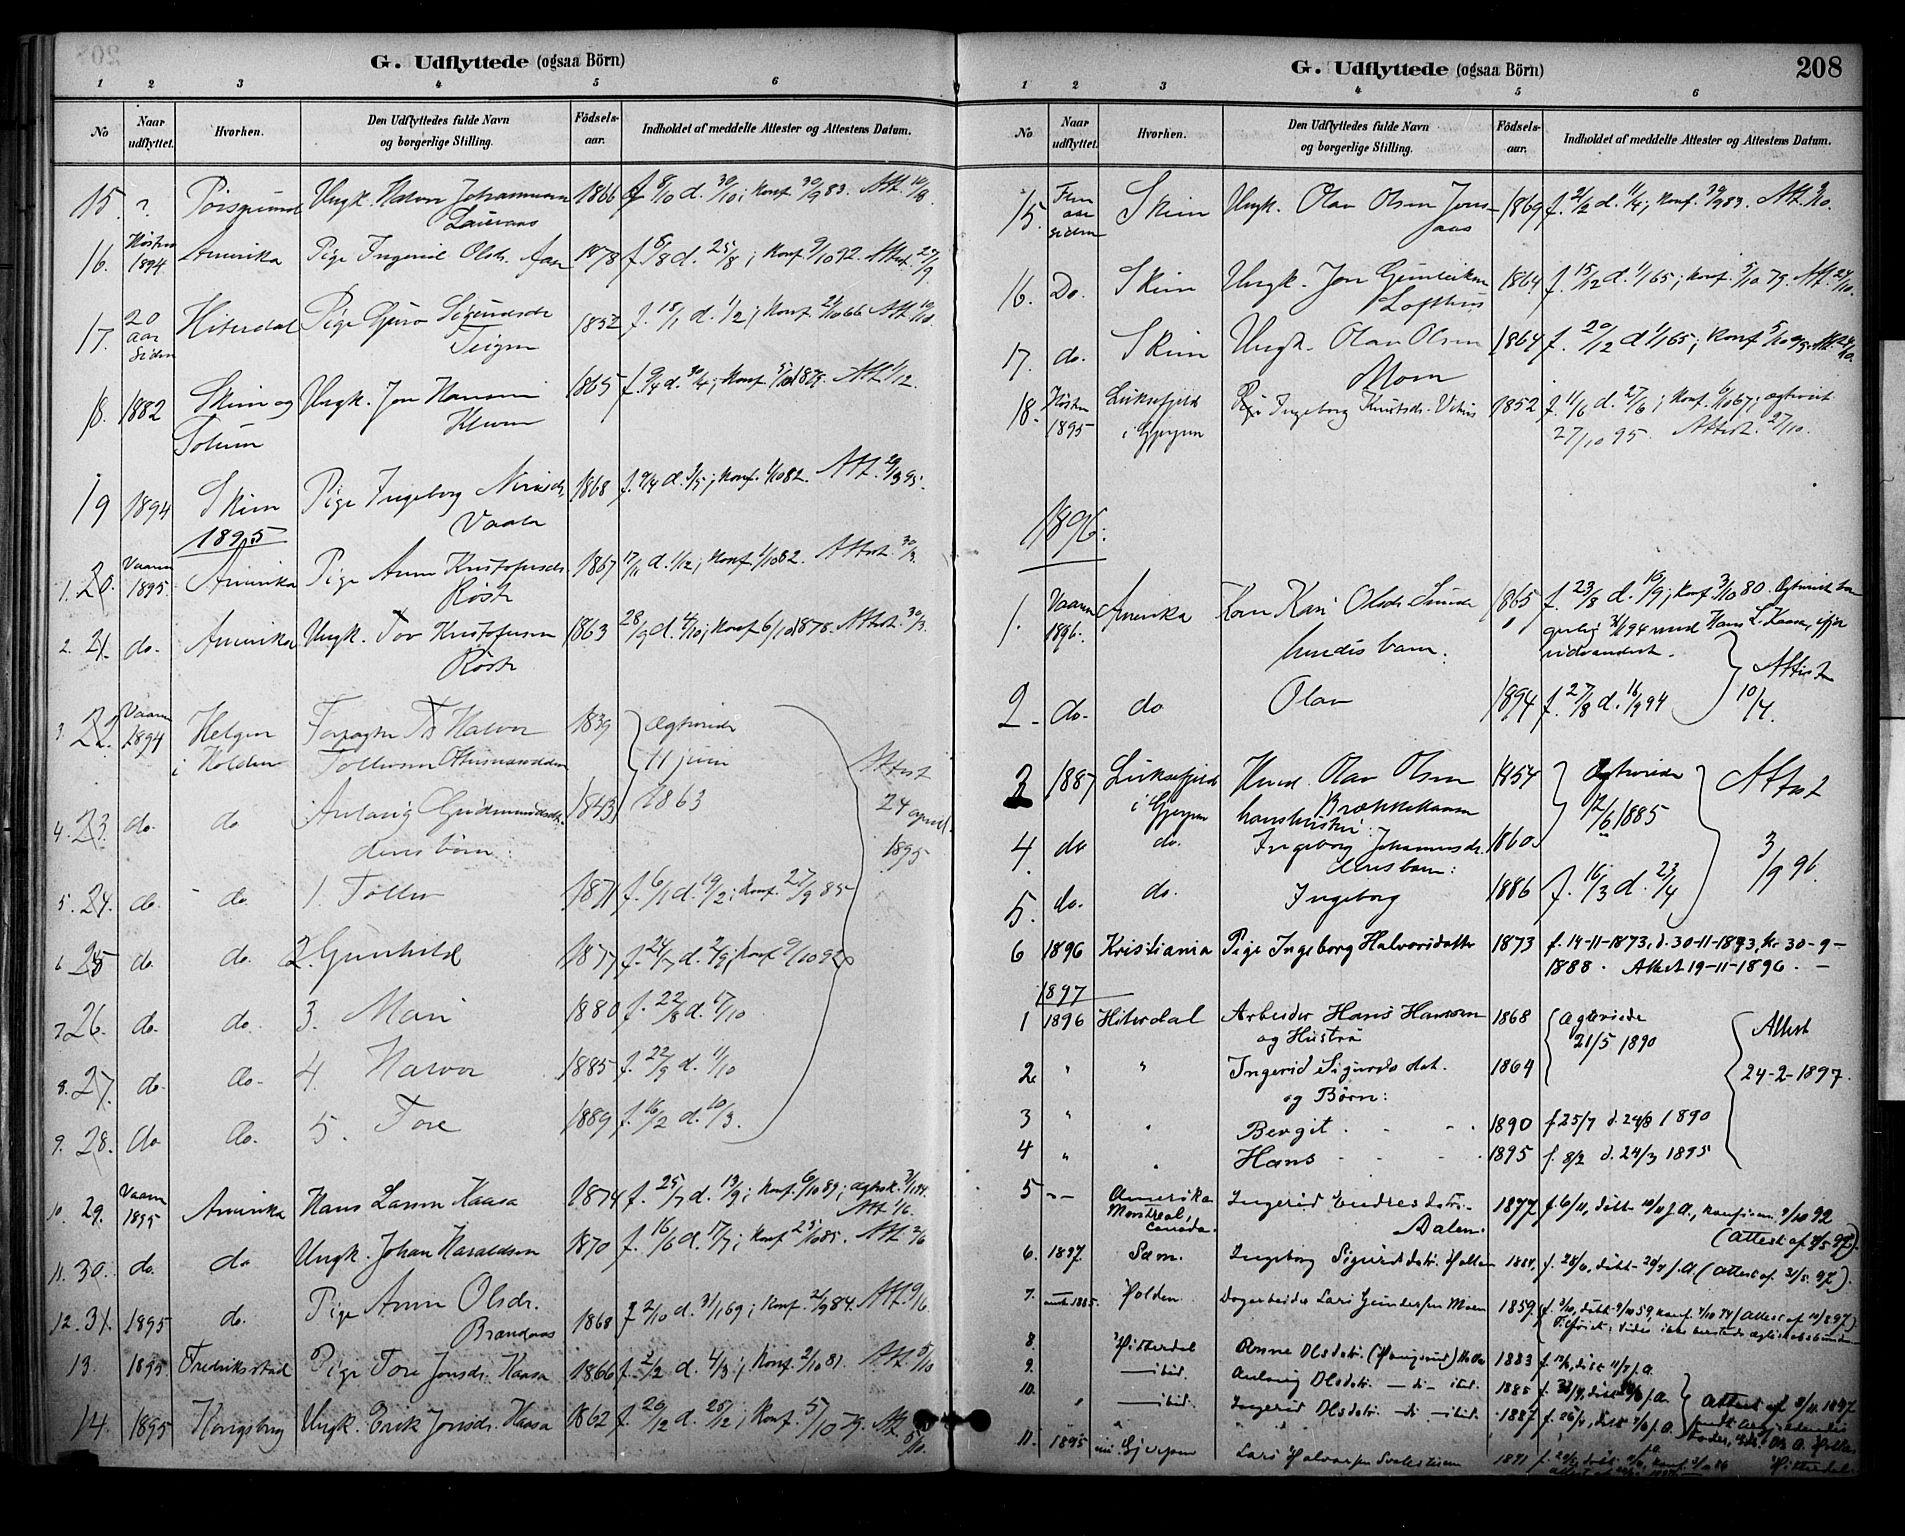 SAKO, Sauherad kirkebøker, F/Fa/L0009: Ministerialbok nr. I 9, 1887-1912, s. 208